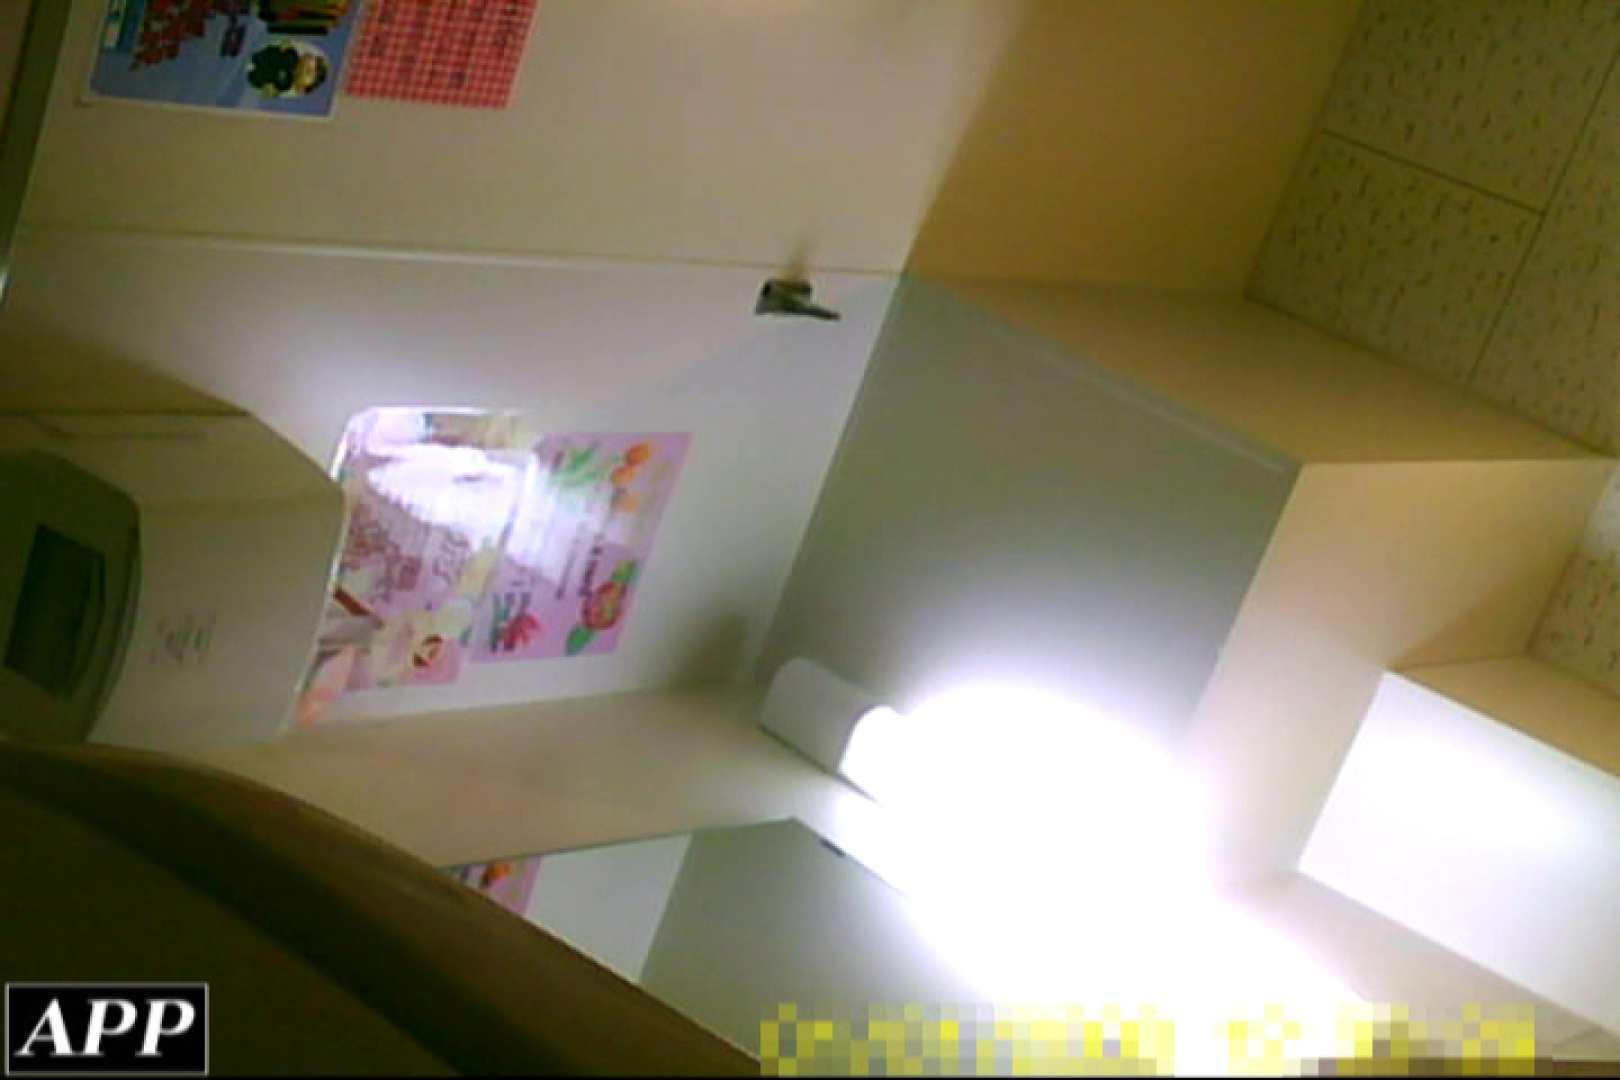 3視点洗面所 vol.139 丸見え オマンコ無修正動画無料 108枚 59